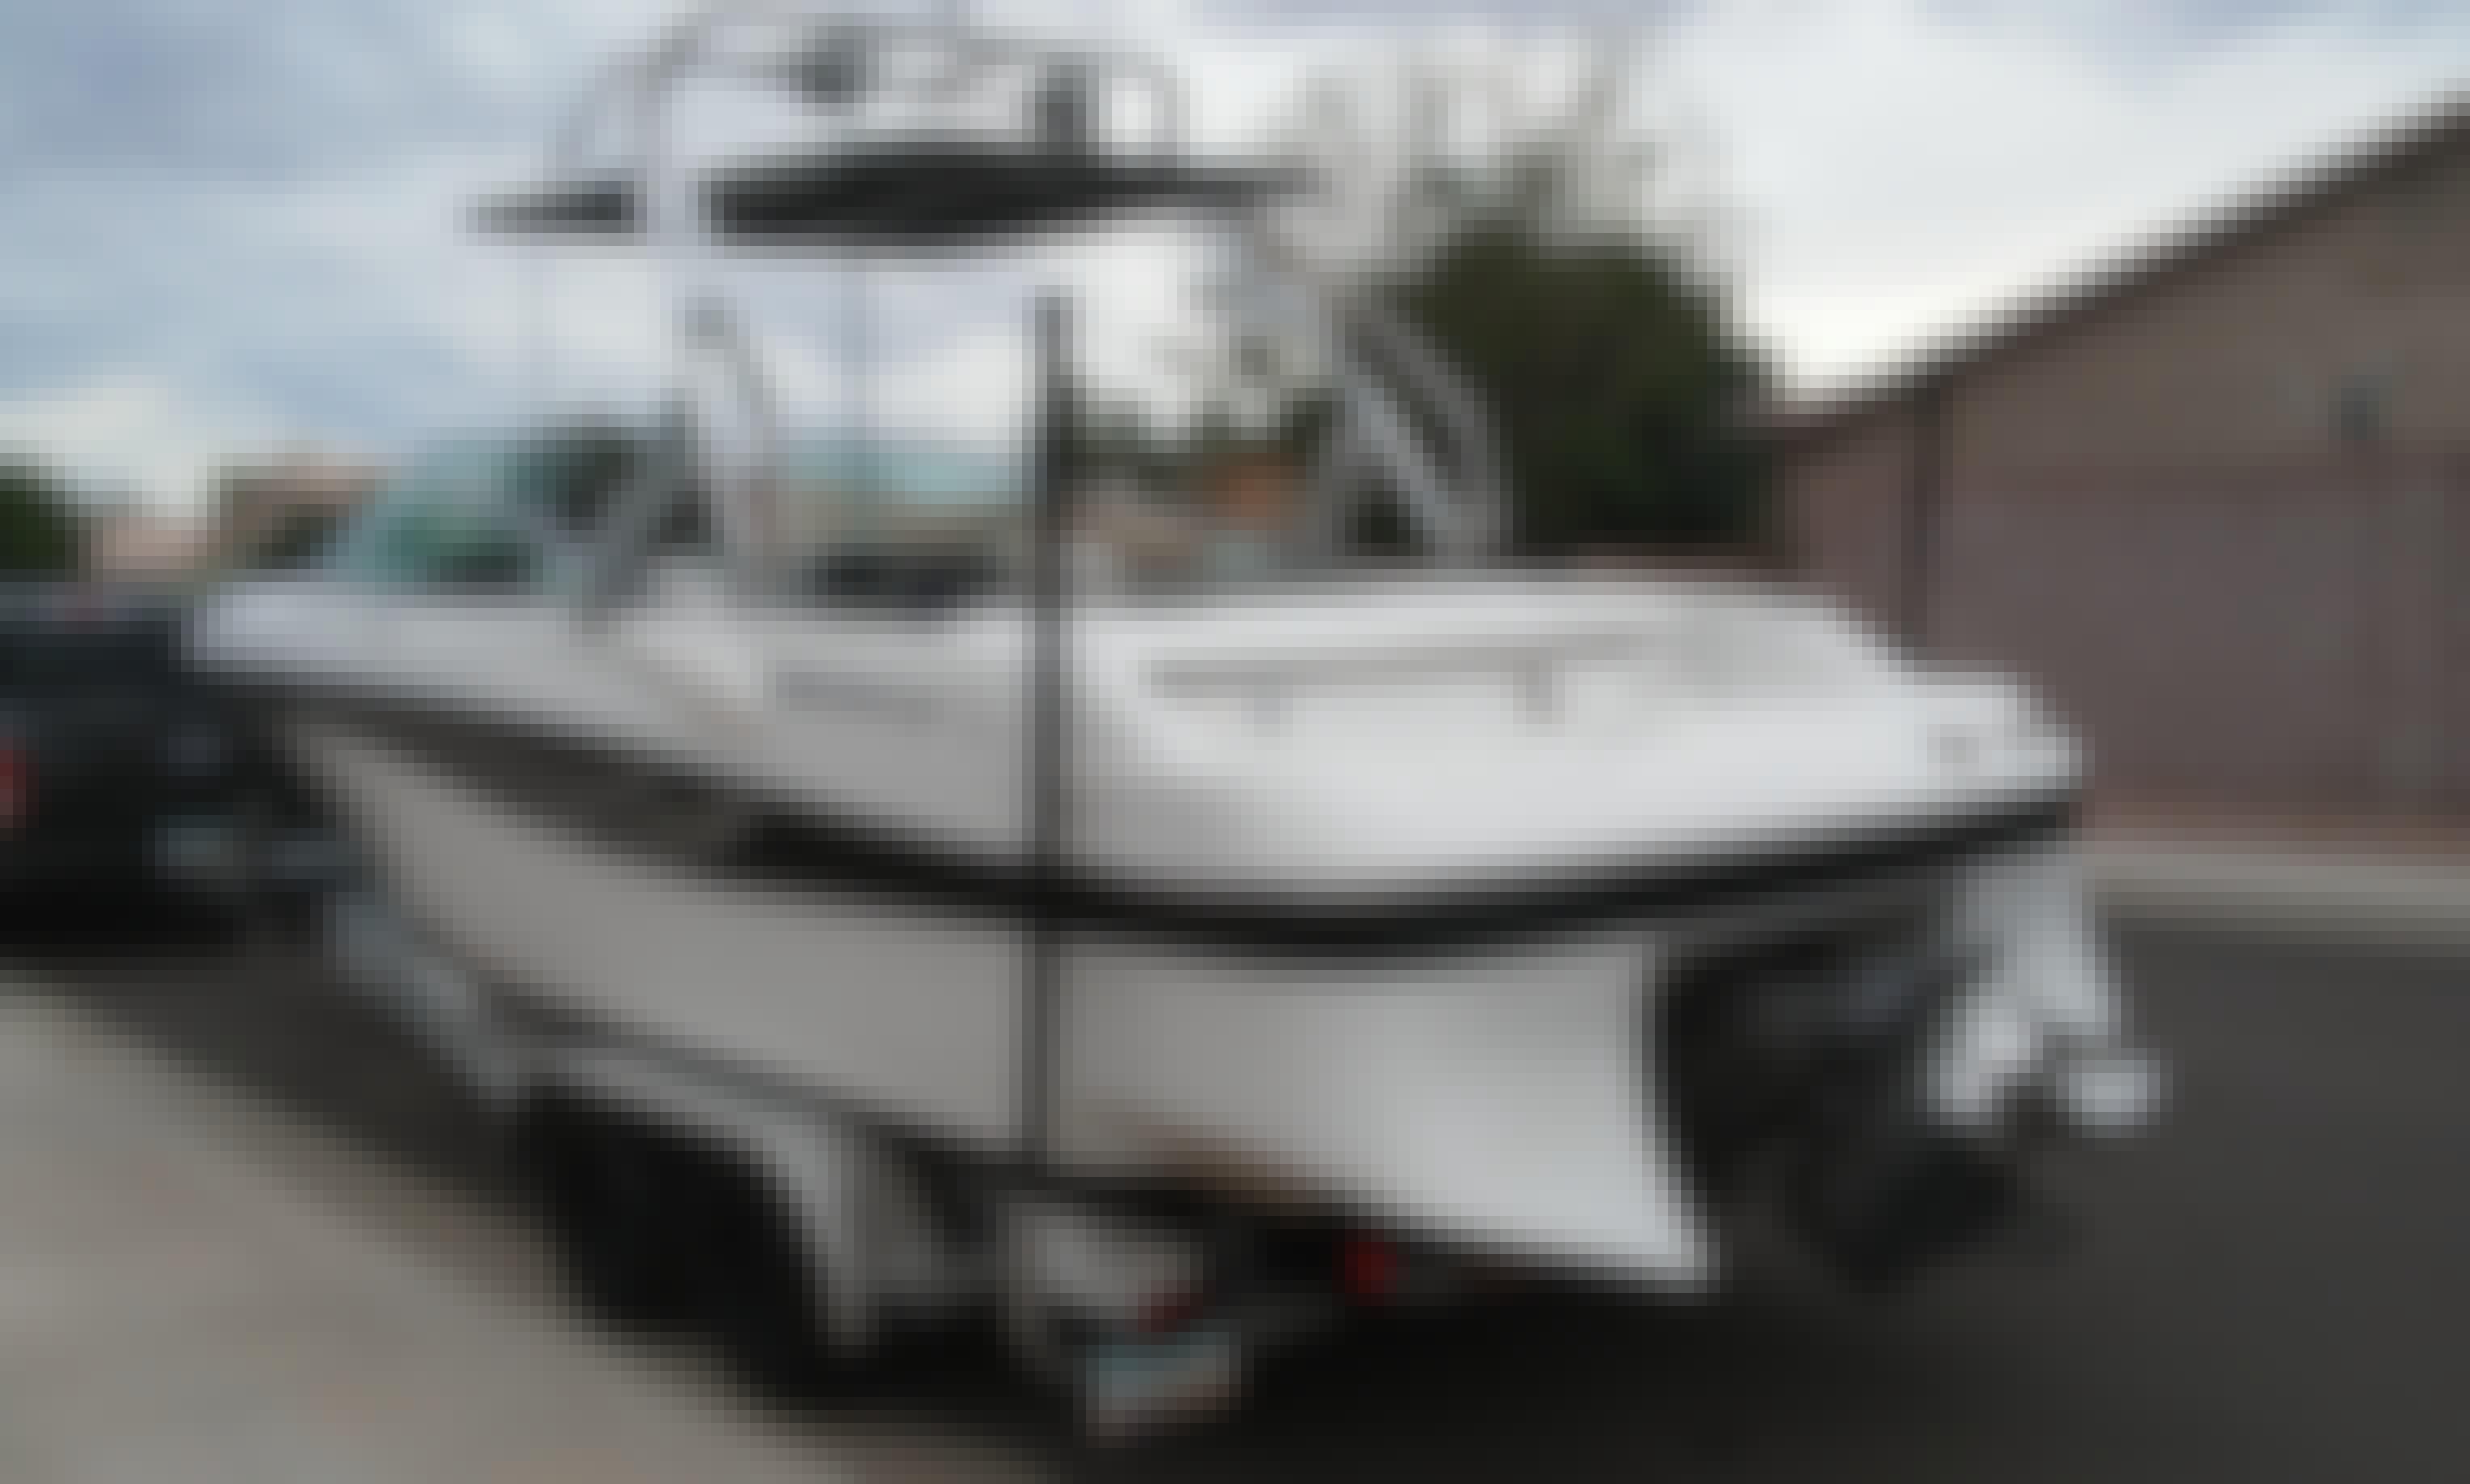 Rent 26' Fourwinns Powerboat in Canyon Lake Arizona - Seats 11